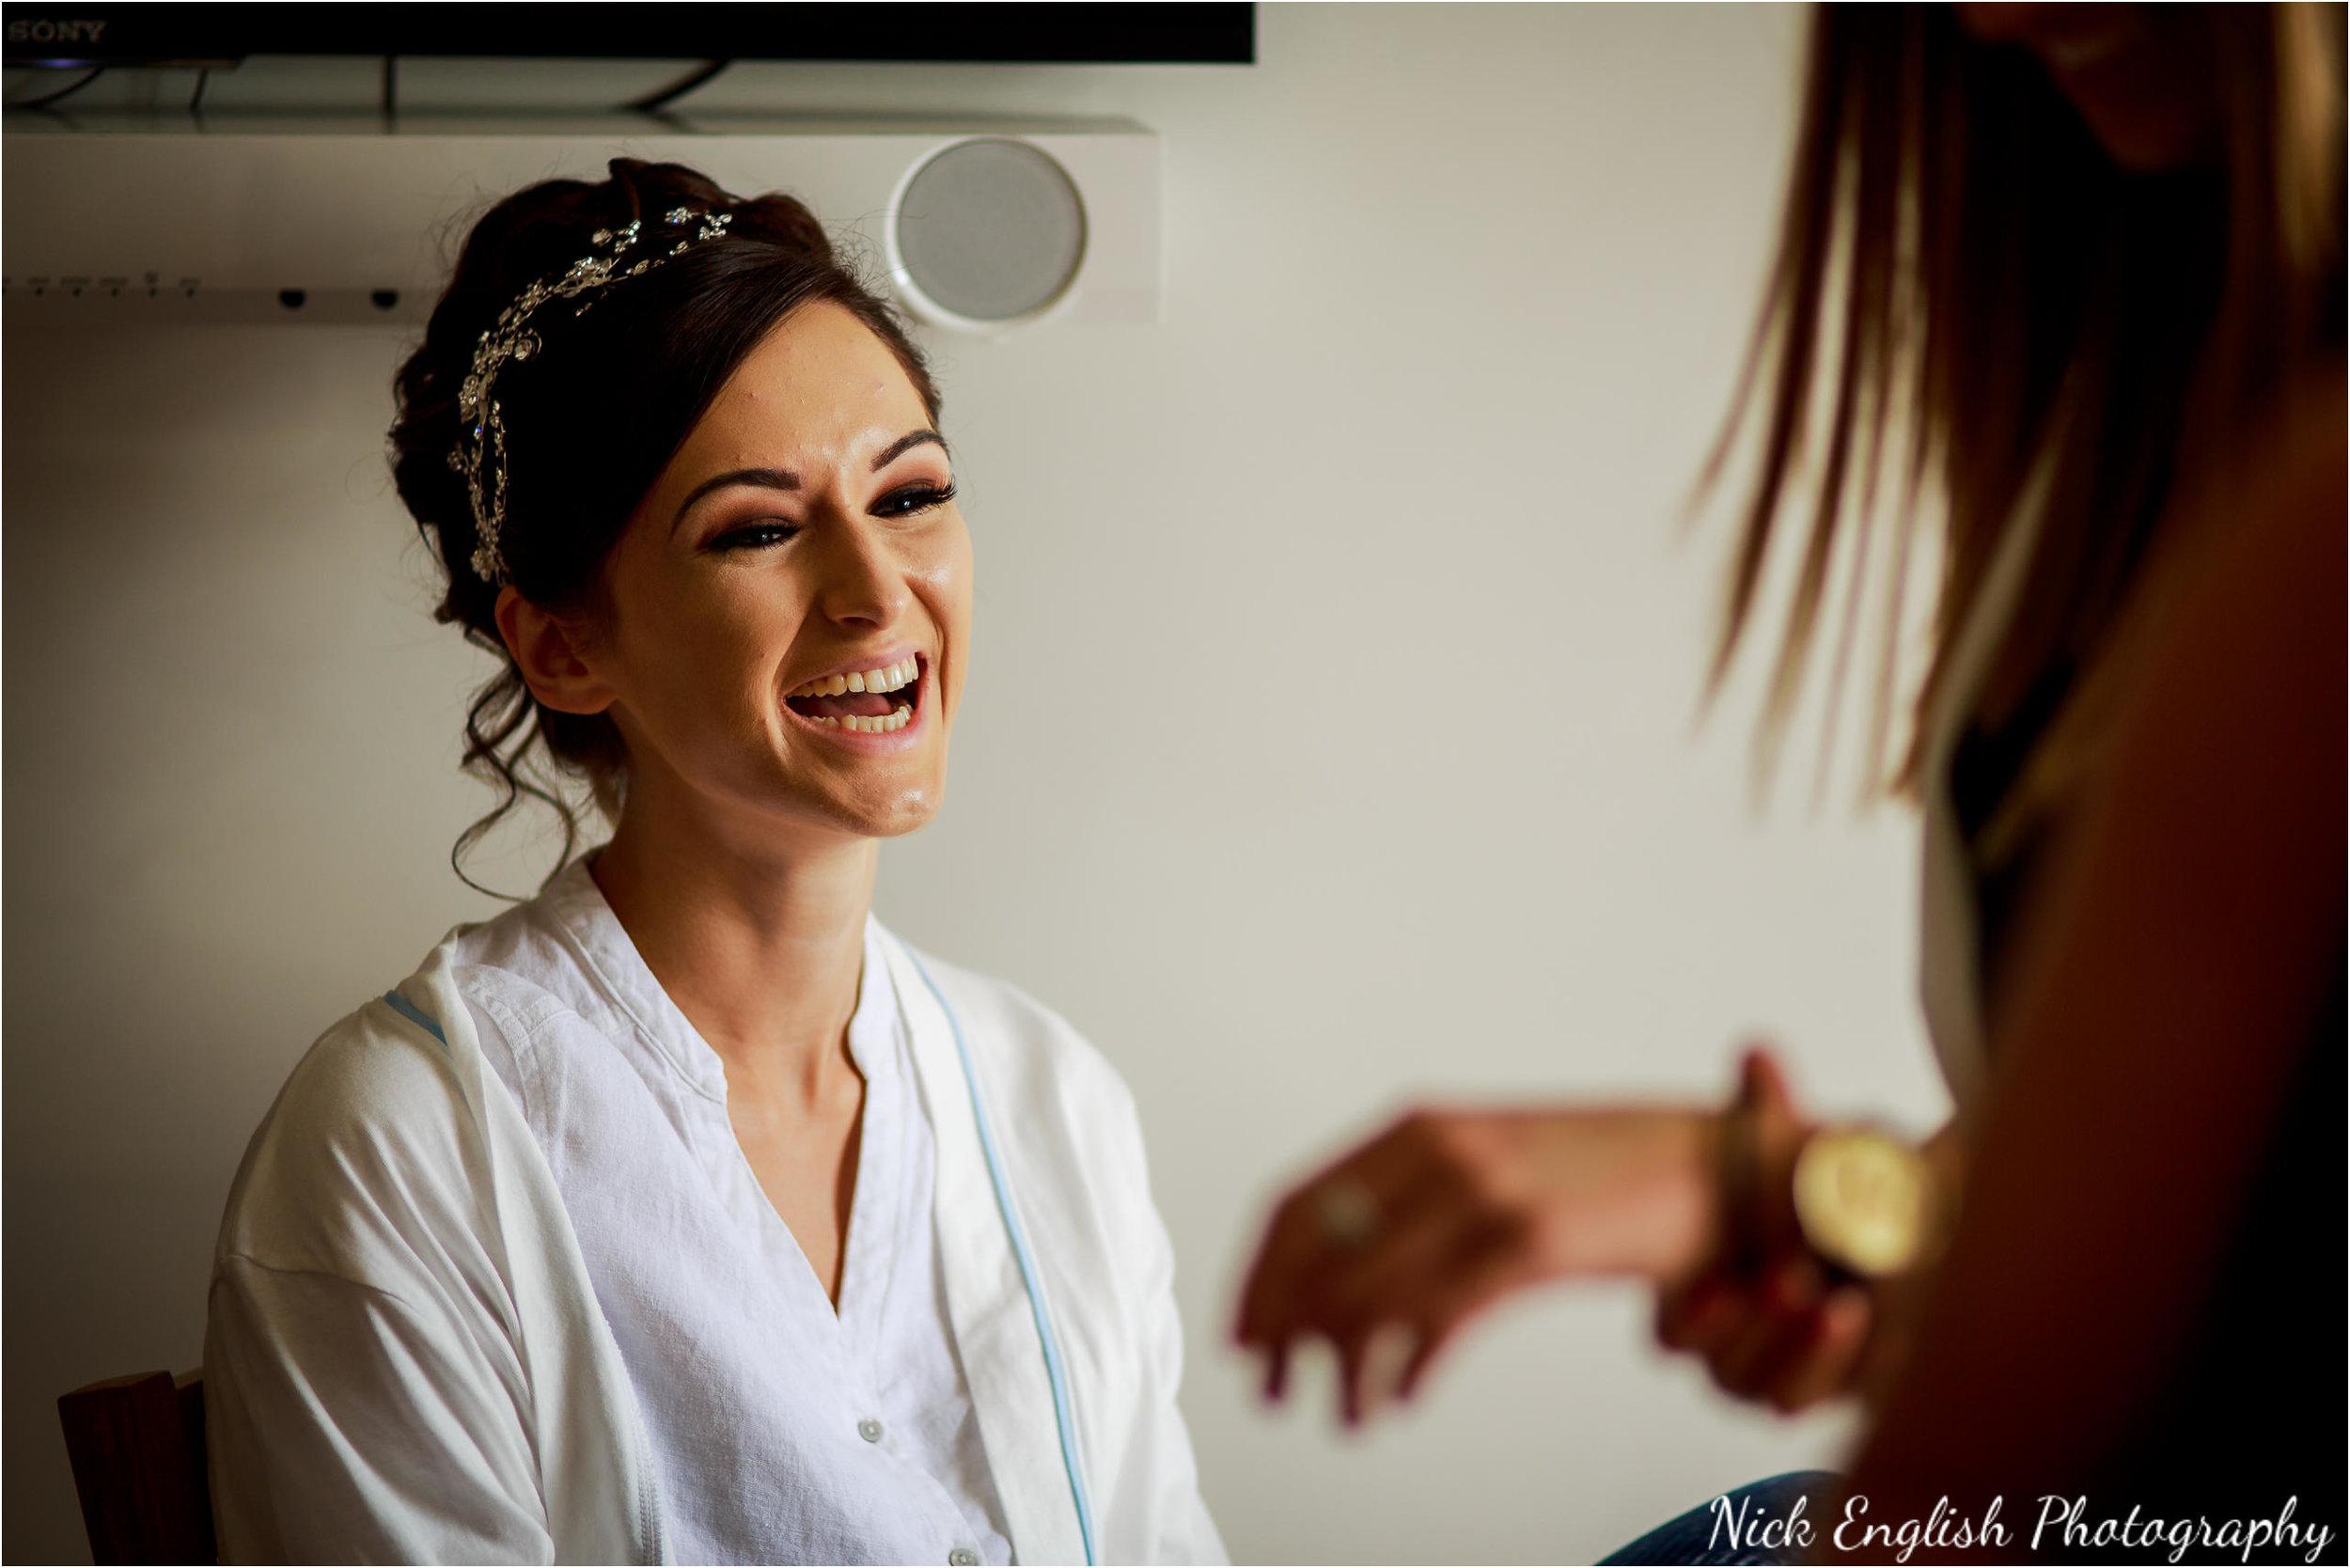 Emily David Wedding Photographs at Barton Grange Preston by Nick English Photography 16jpg.jpeg